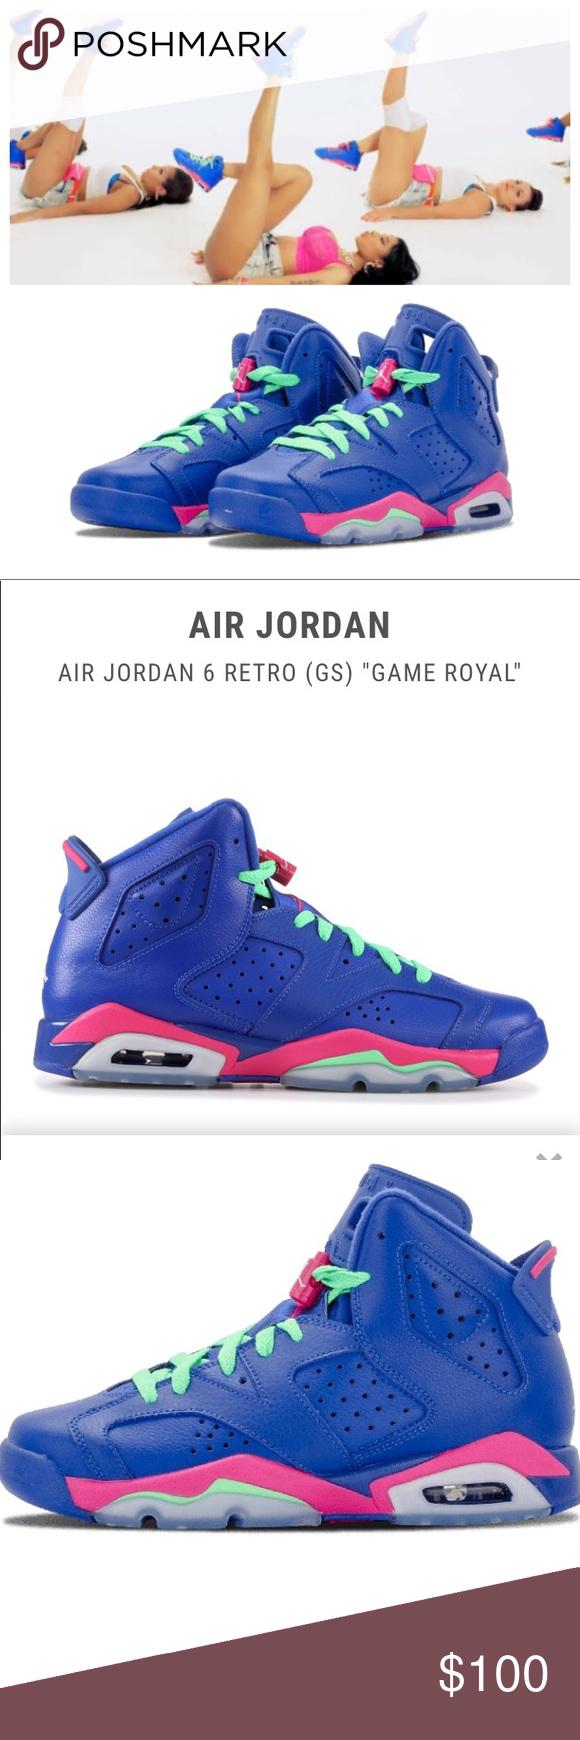 213afbed604c ... shop air jordan 6 retro gs game royal. sz 5y these jordans are featured  32c50